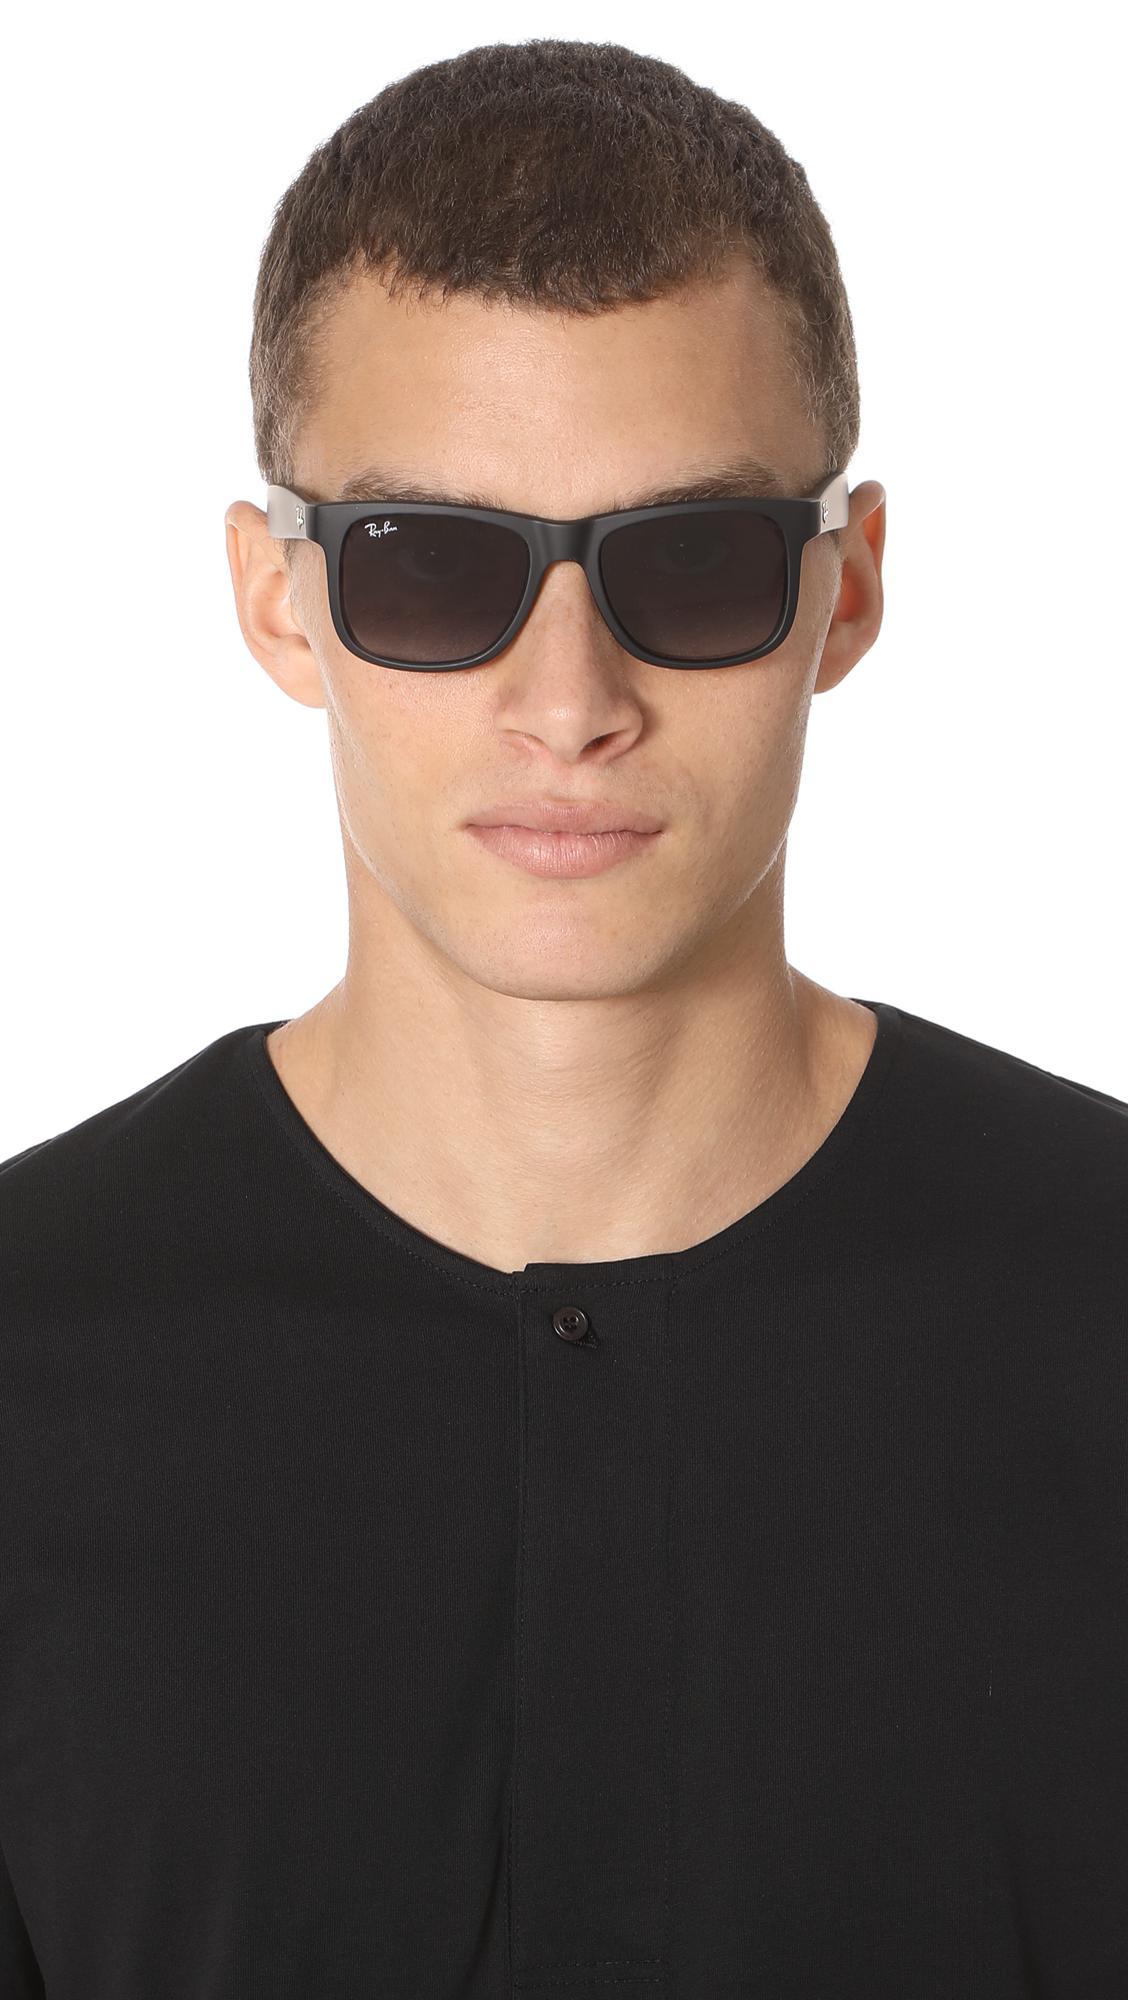 de92f600b0 Ray-Ban - Black Justin Sunglasses for Men - Lyst. View fullscreen